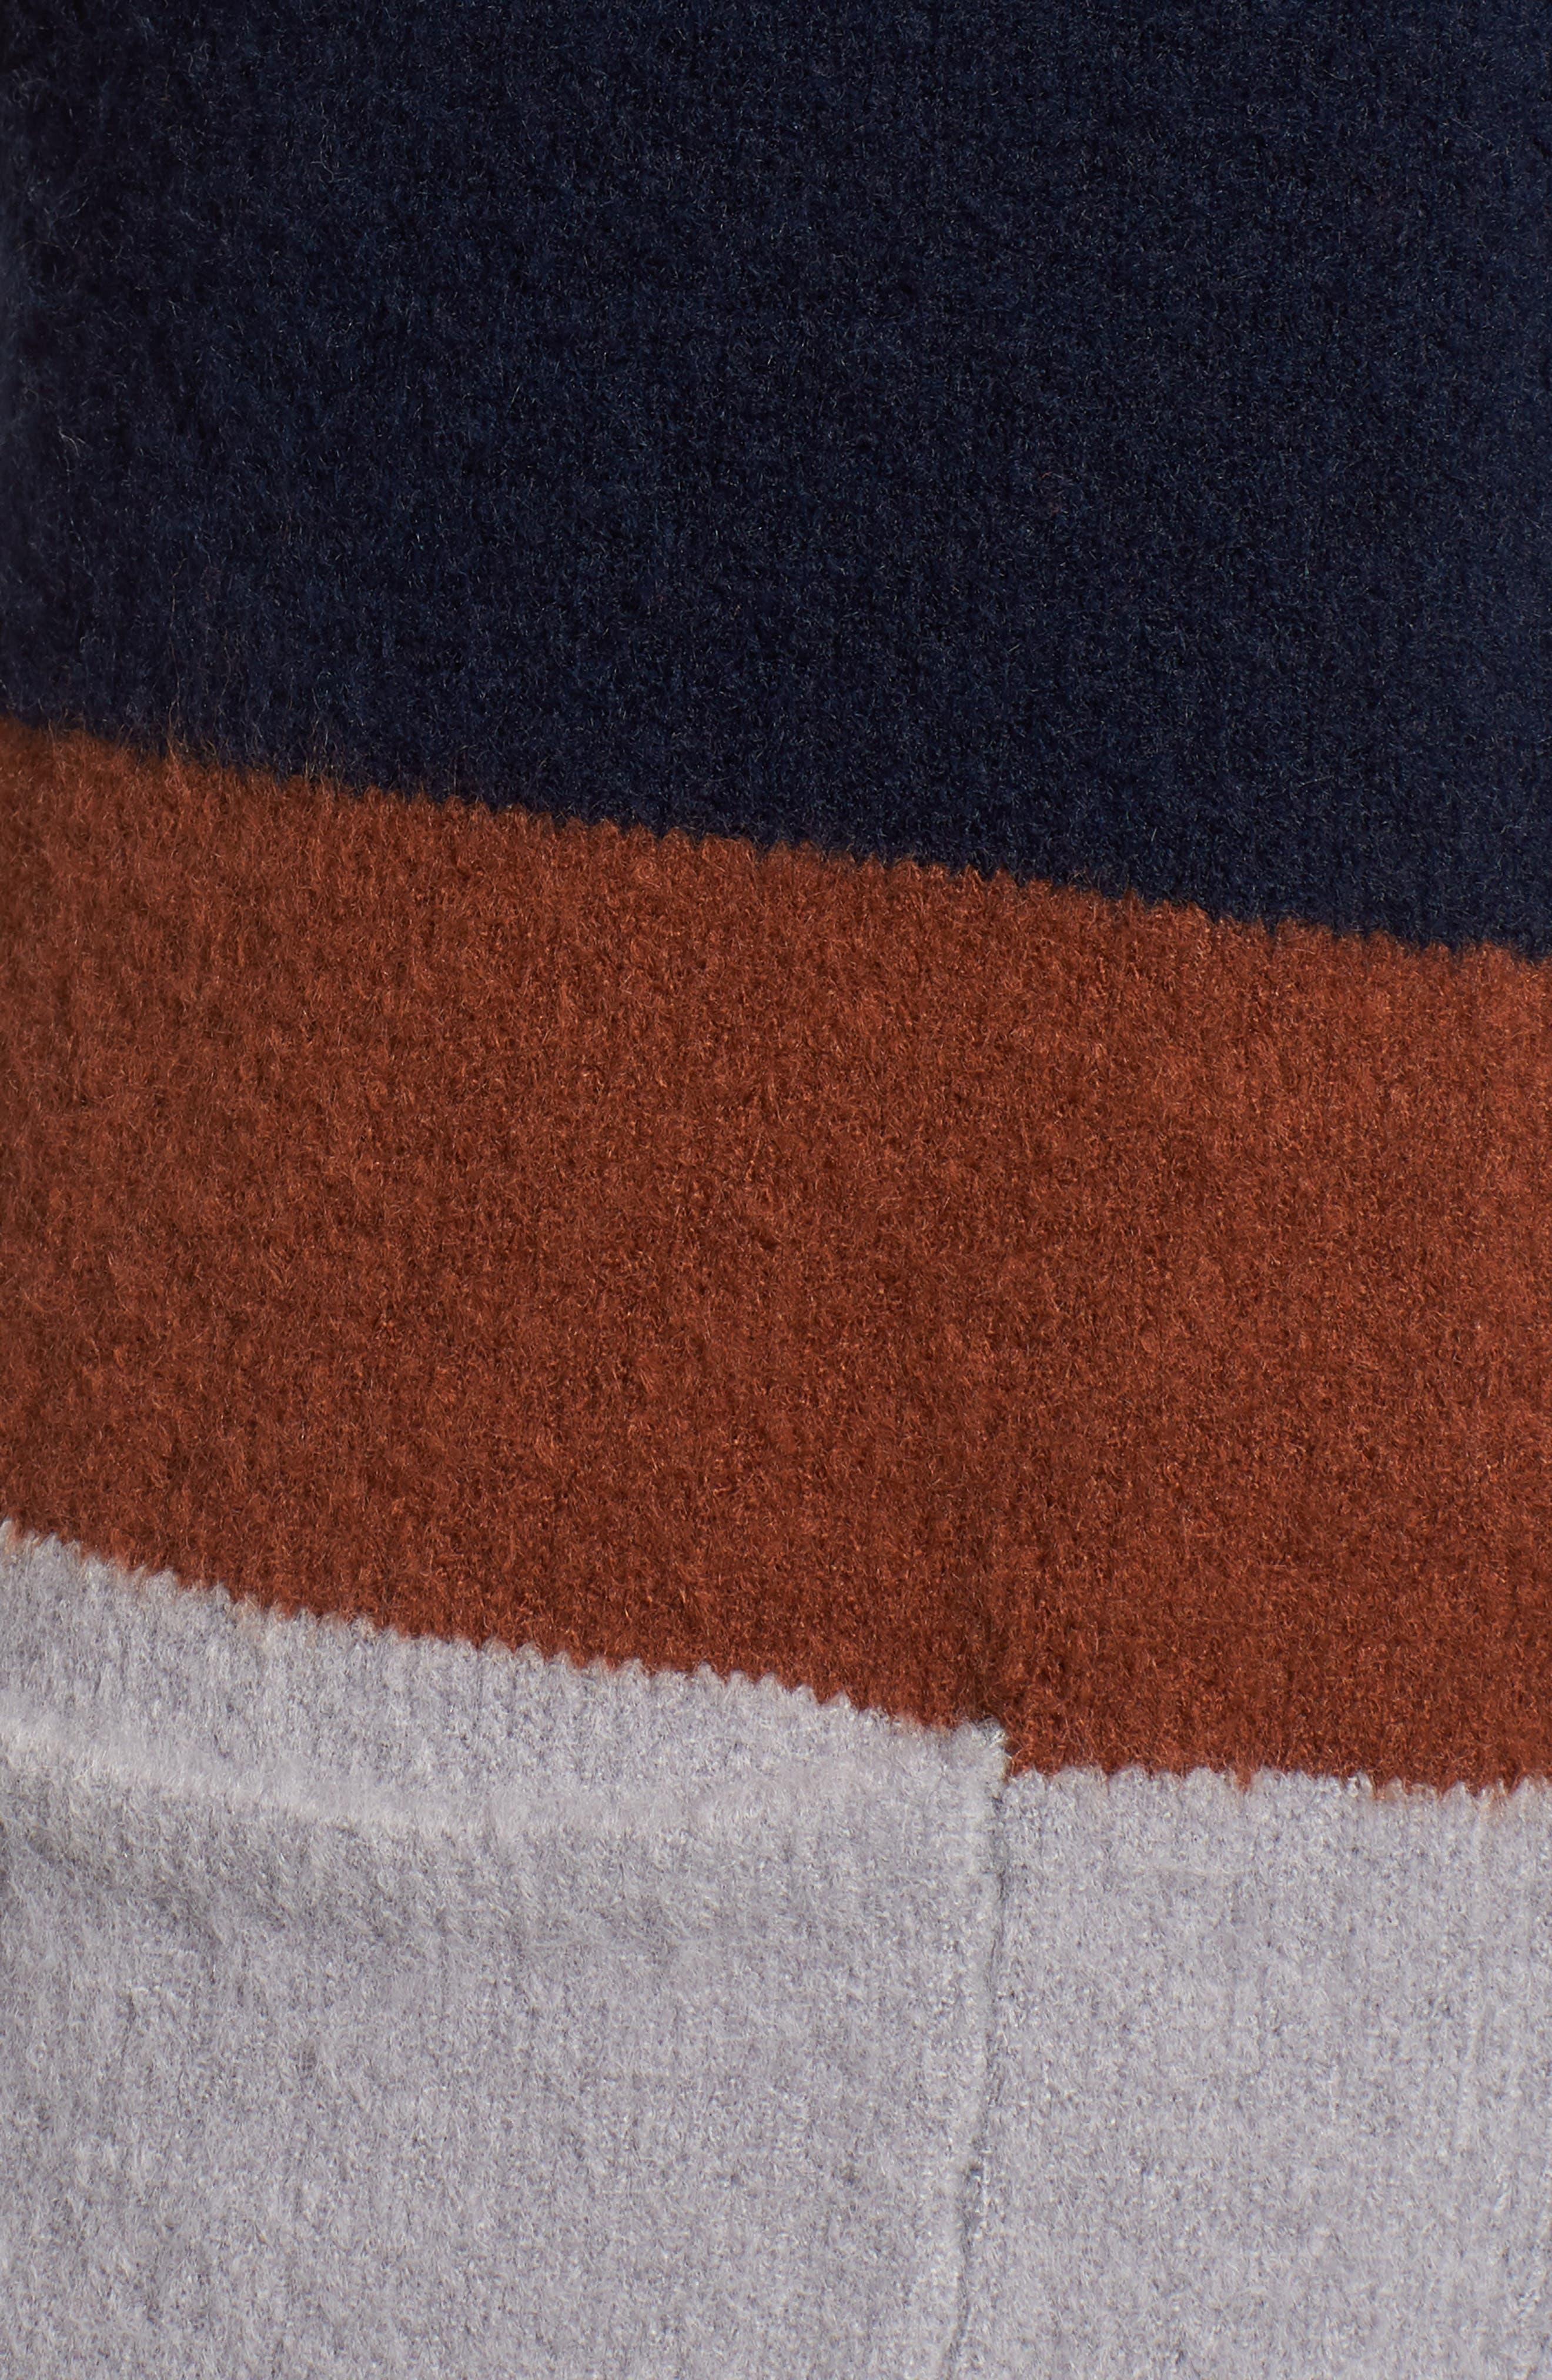 Colorblock Cardigan,                             Alternate thumbnail 5, color,                             NAVY/ GREY/ BLACK